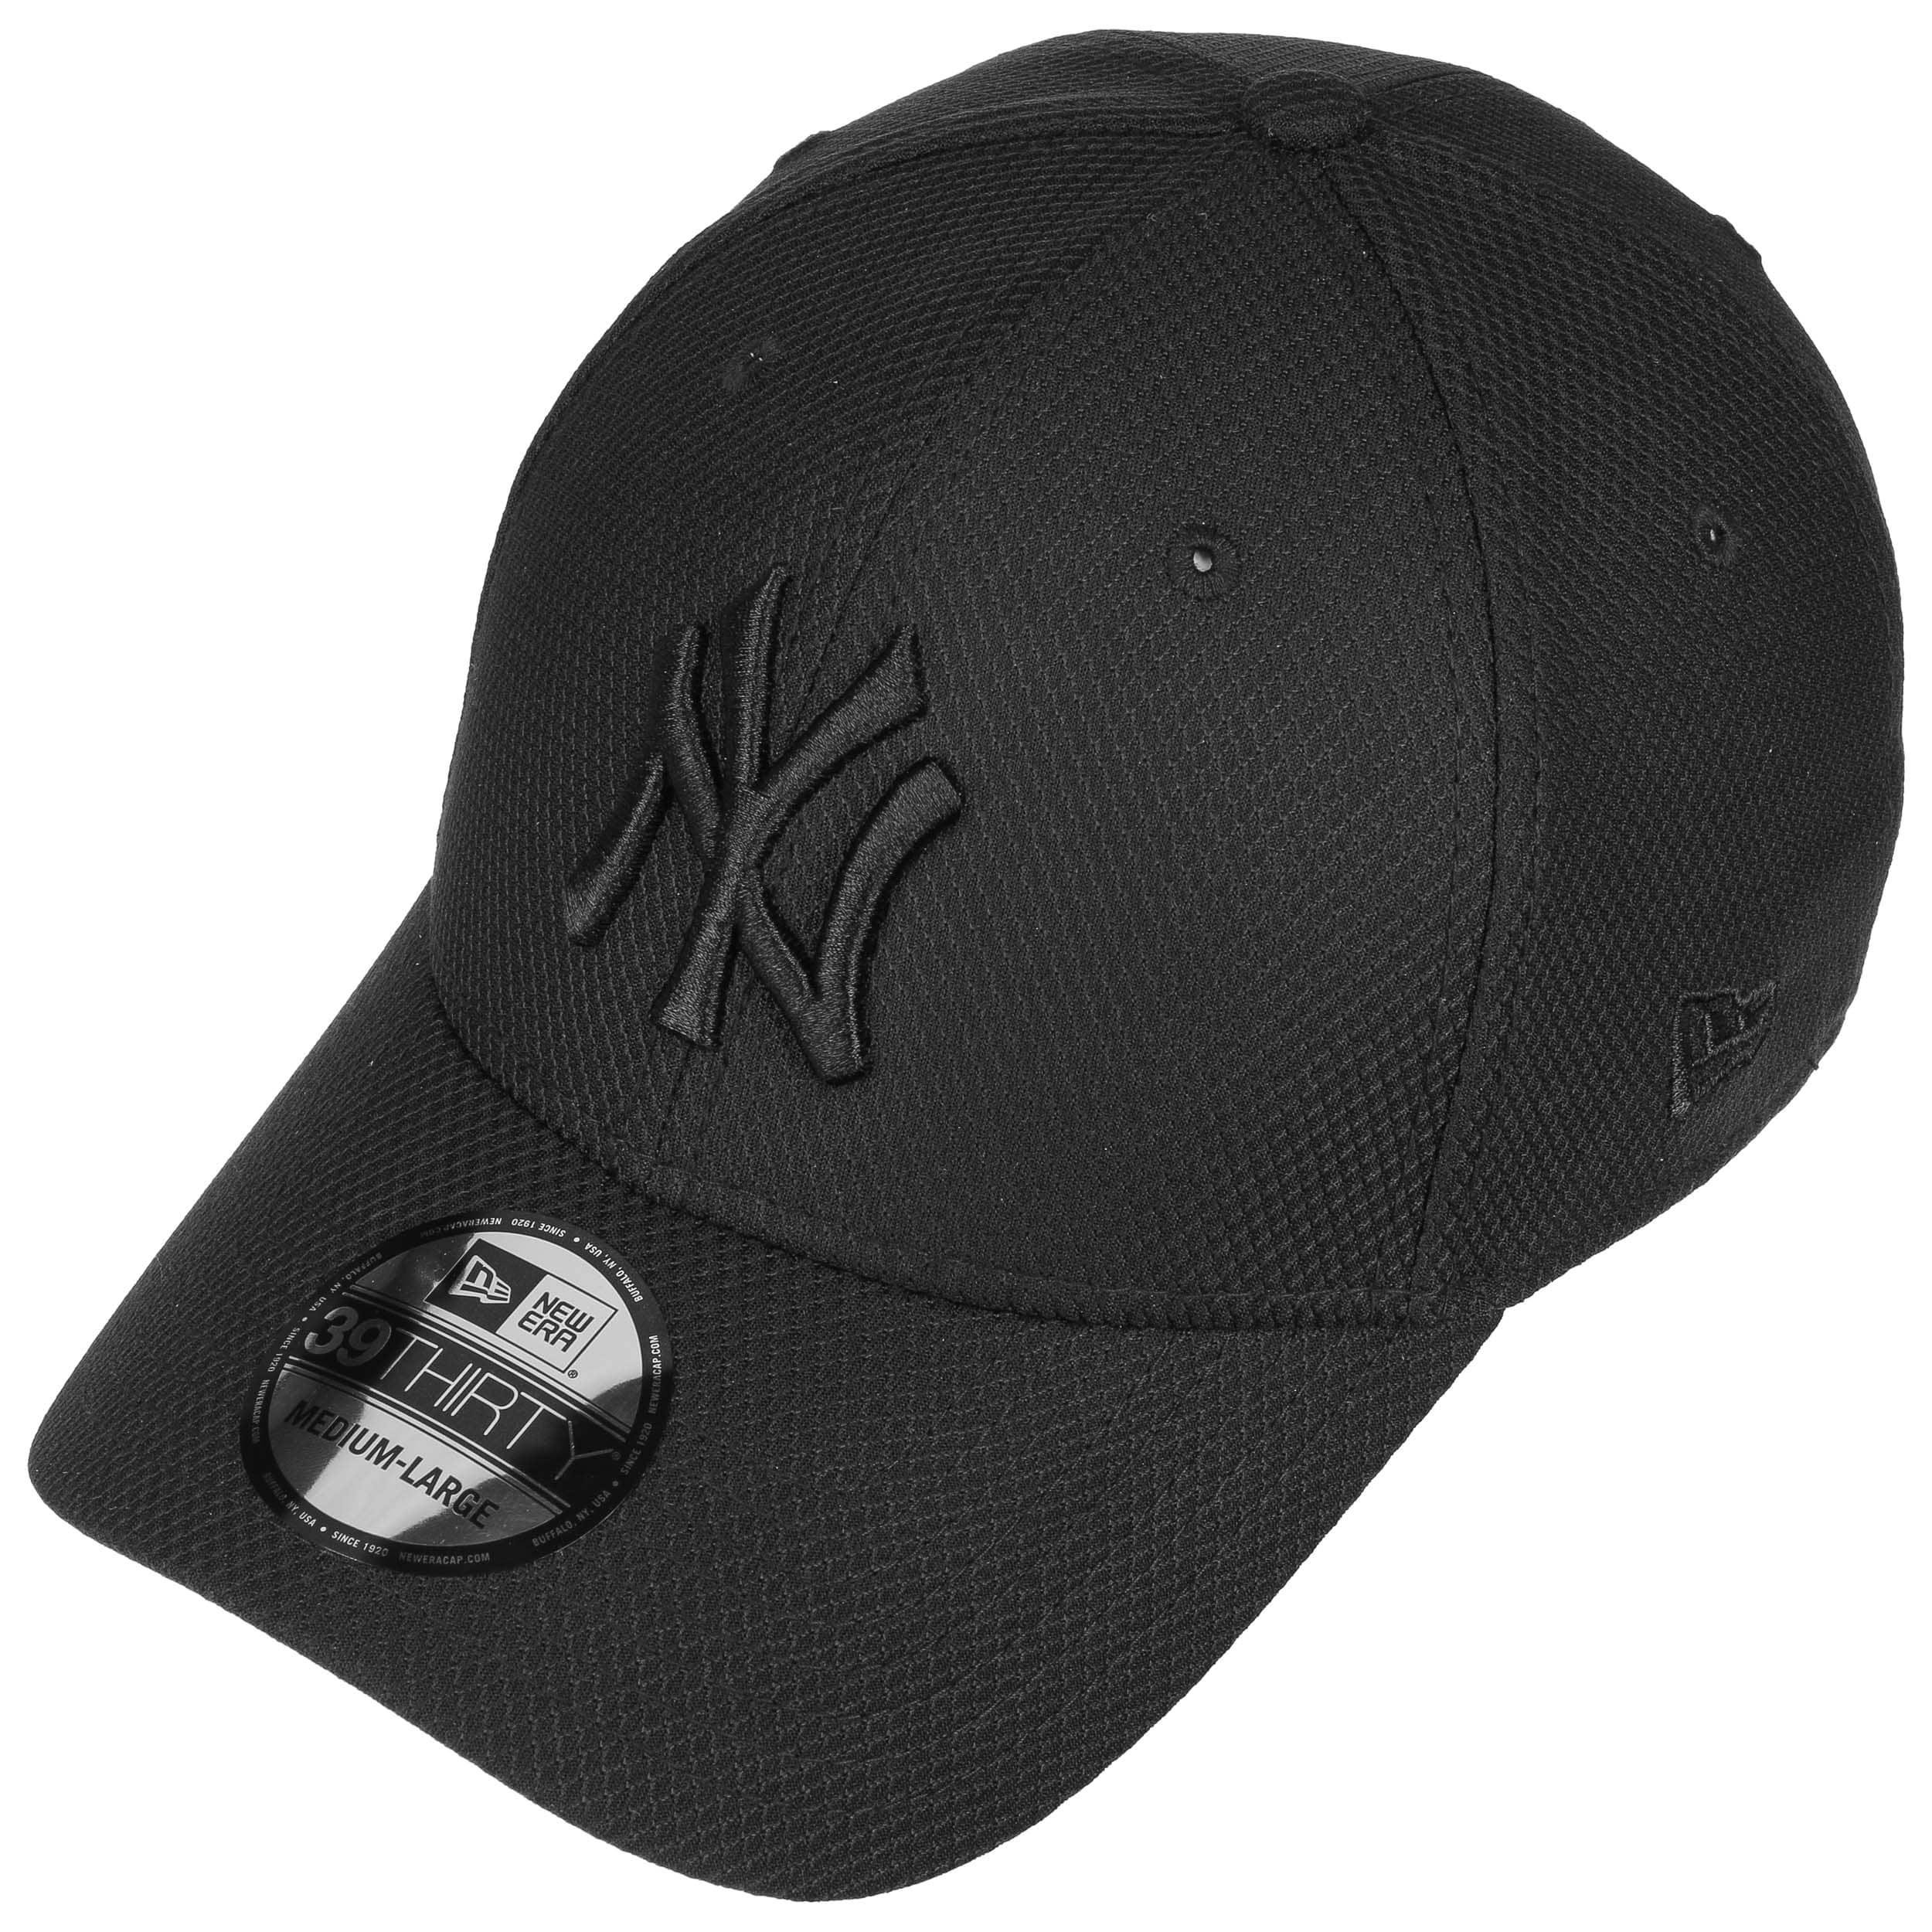 02c7f382305d6 Gorra 39Thirty Yankees Diamond by New Era - Gorras - sombreroshop.es